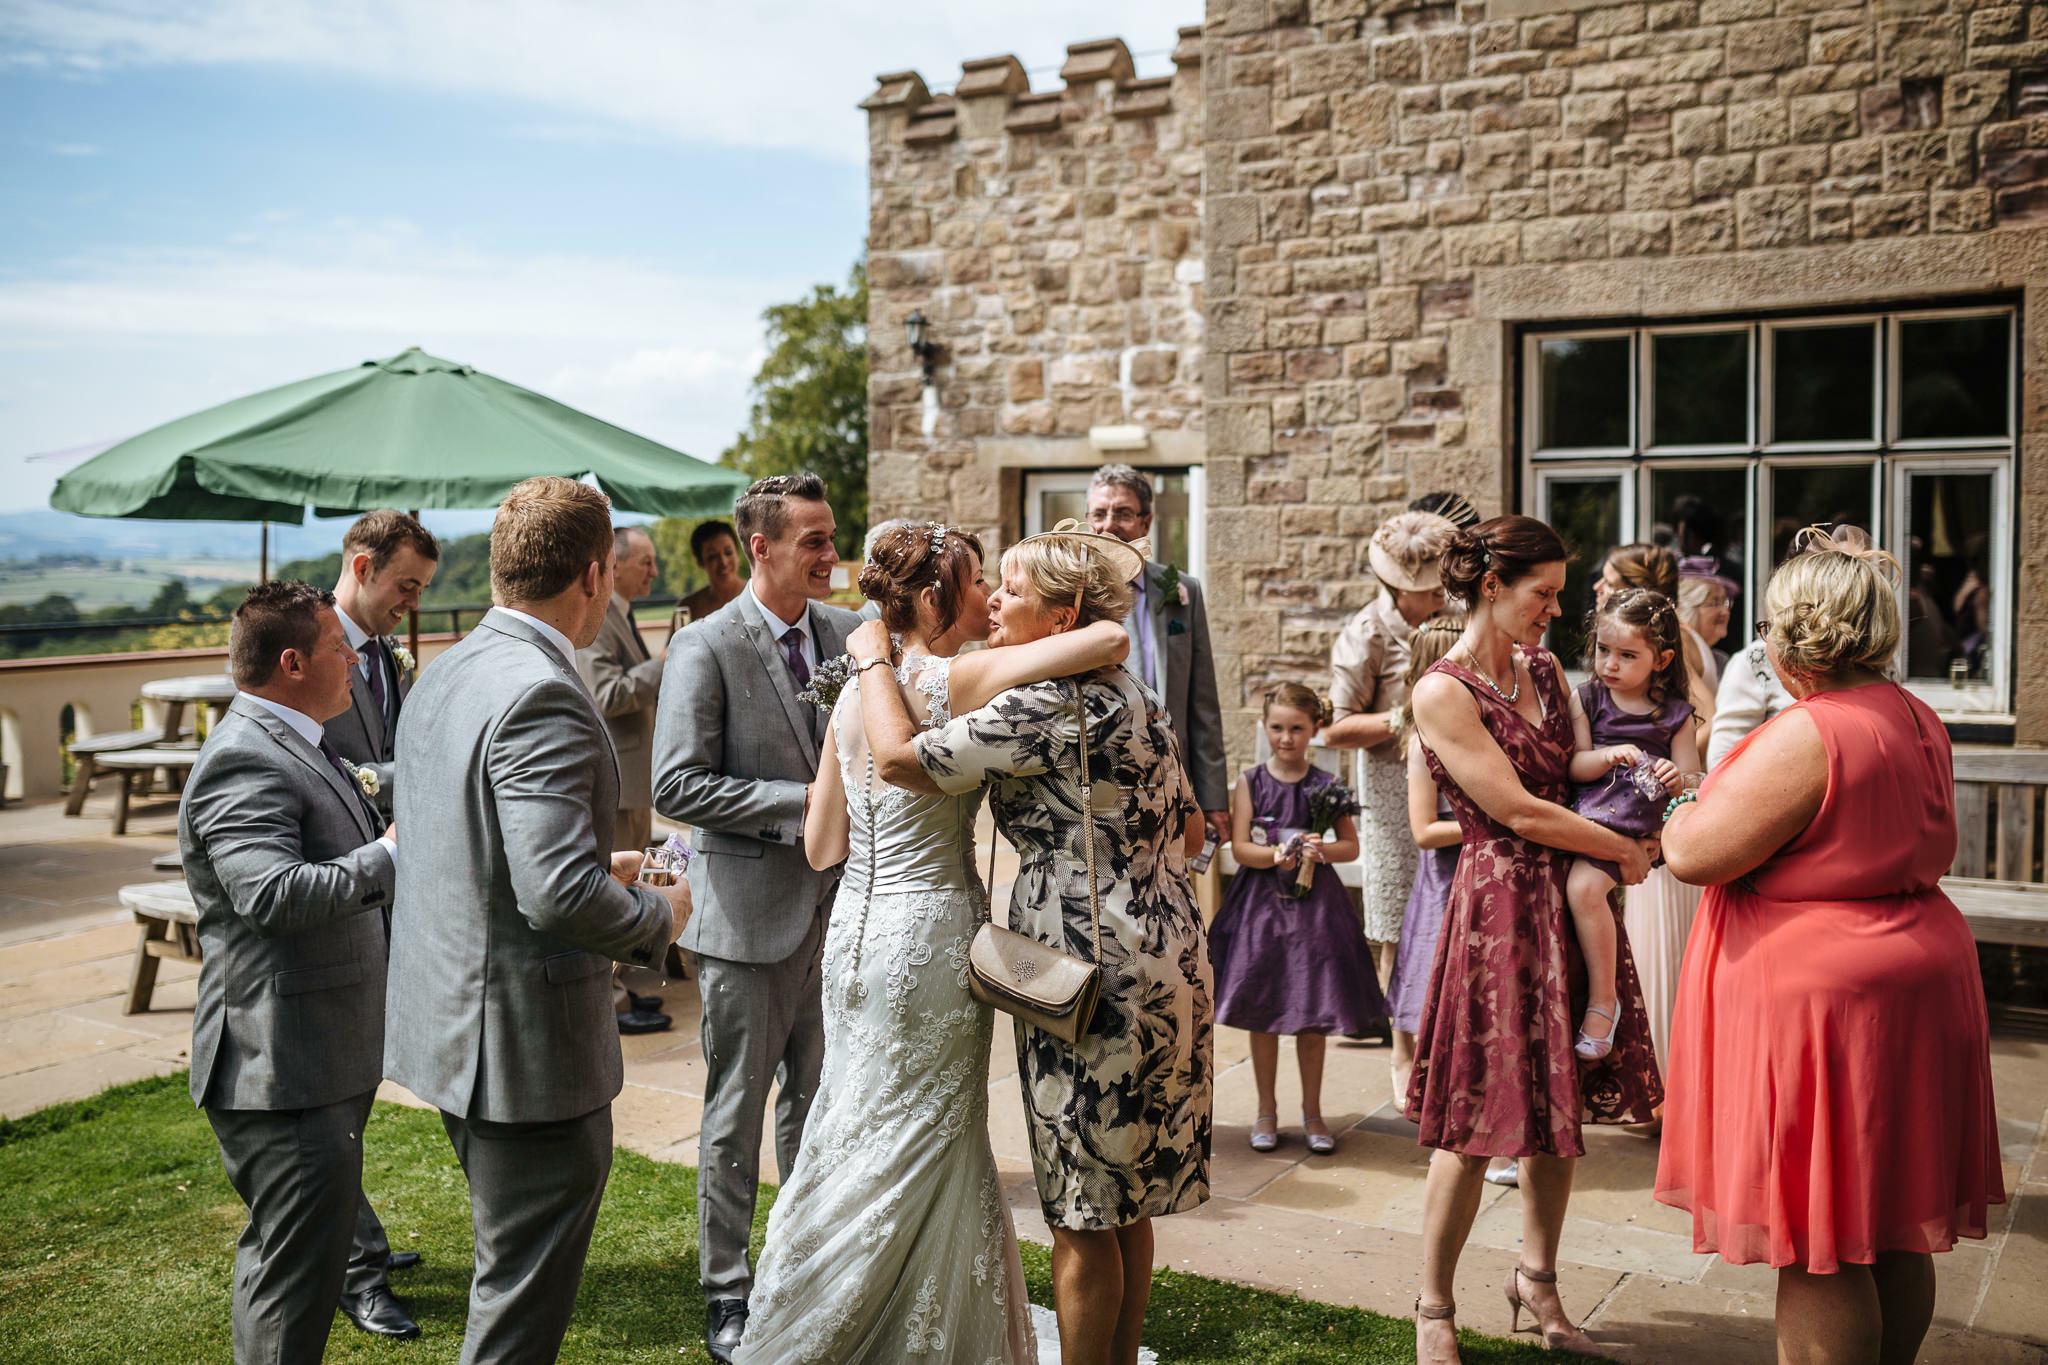 paul-marbrook-Caer-Llan-Wedding-Photographer-90051